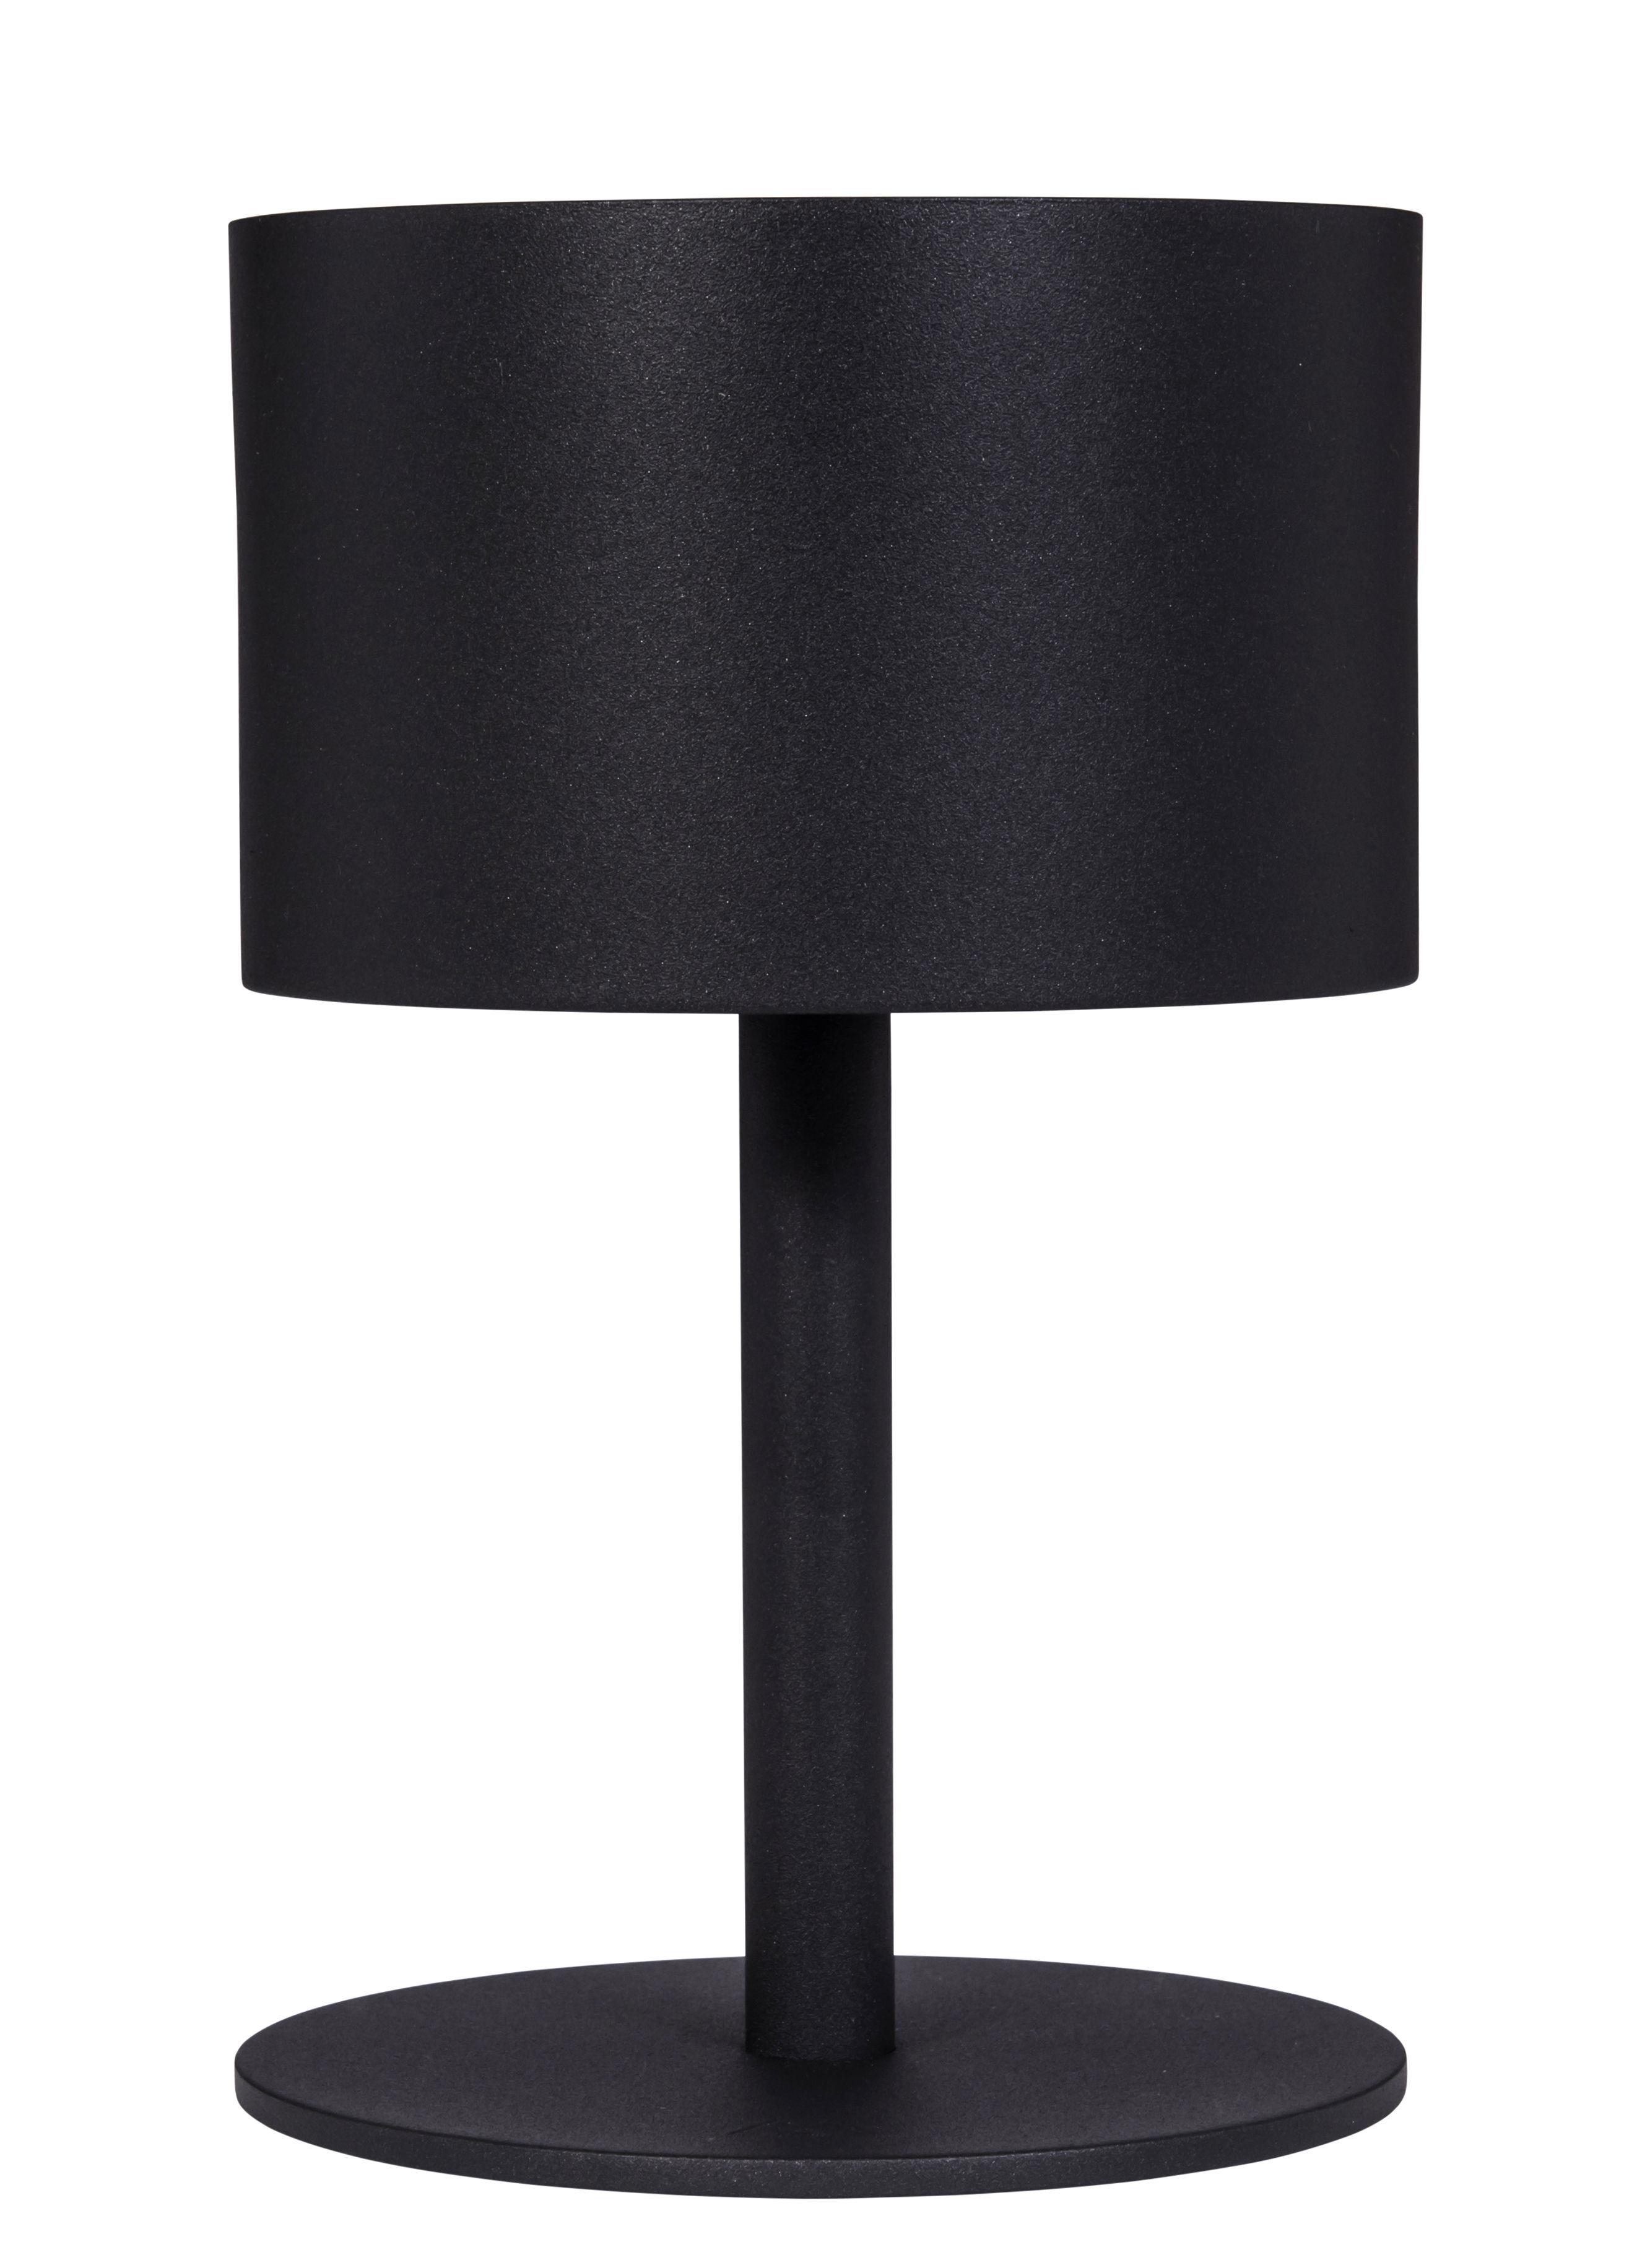 la lampe pose 01 led kabellos maiori solarlampe. Black Bedroom Furniture Sets. Home Design Ideas